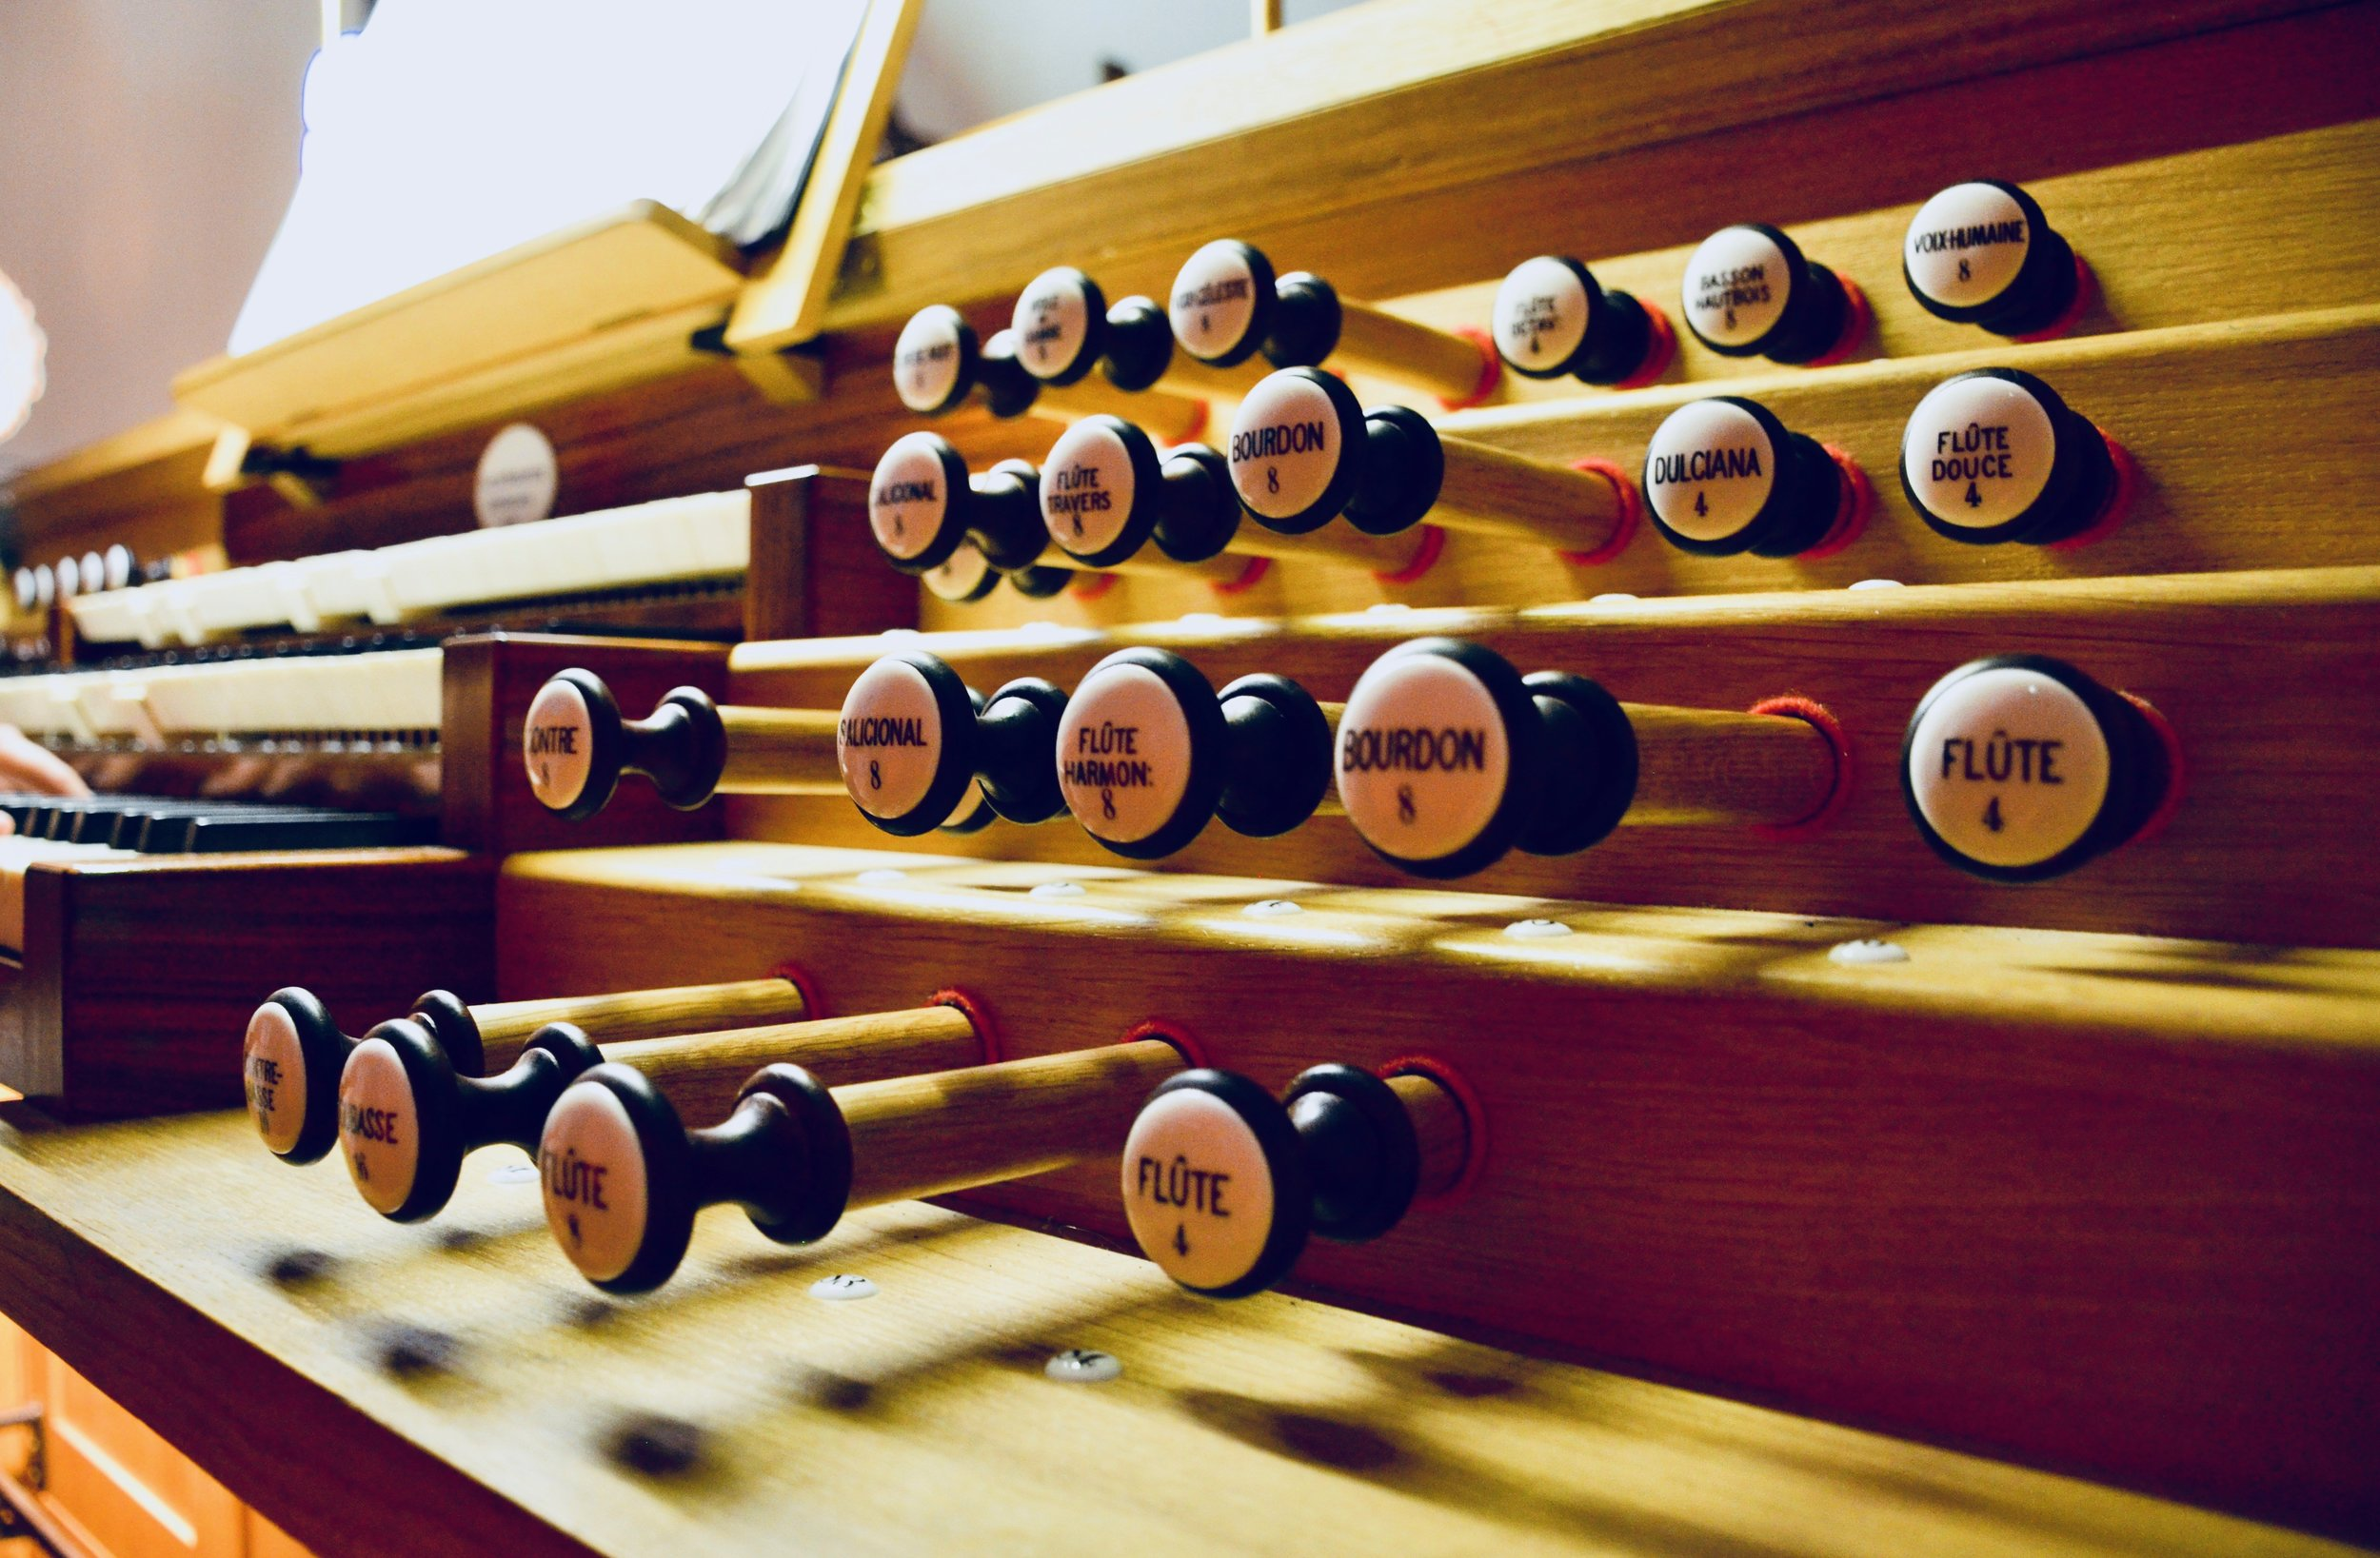 Console detail of the Verschueren French-romantic organ in Orgelpark, Amsterdam.